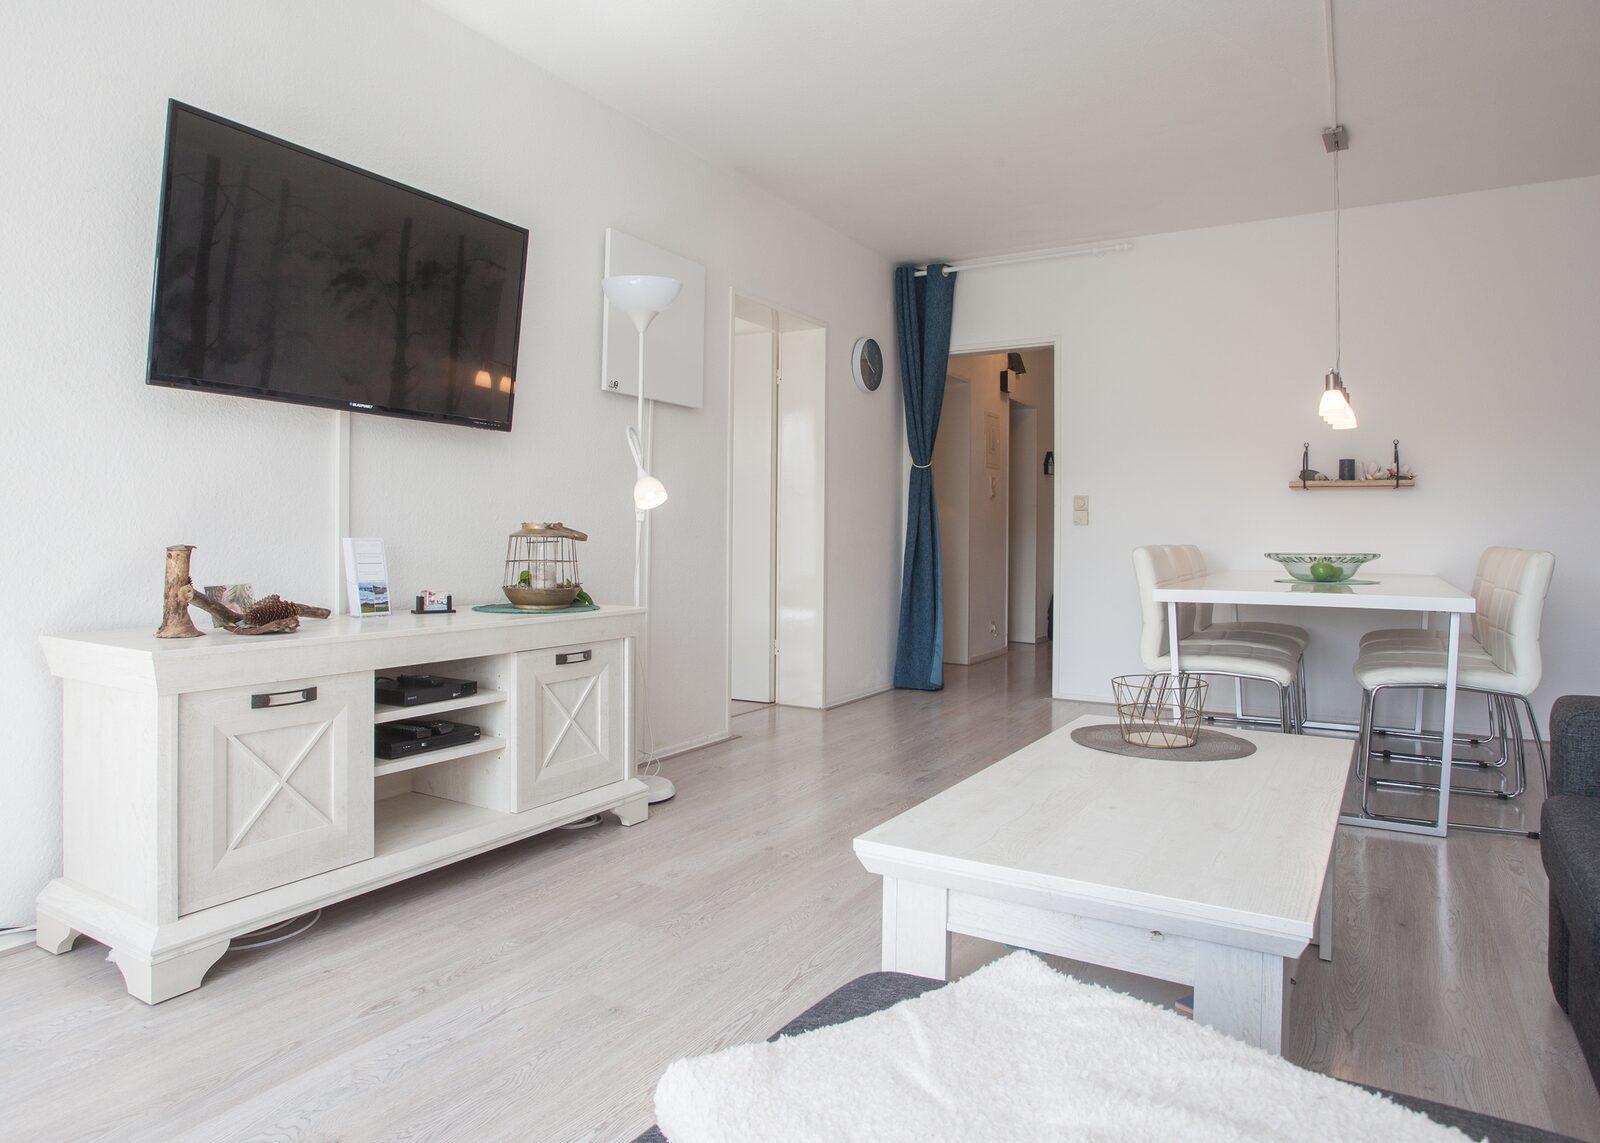 Appartement - Am Bergelchen 60-B | Winterberg-Niedersfeld